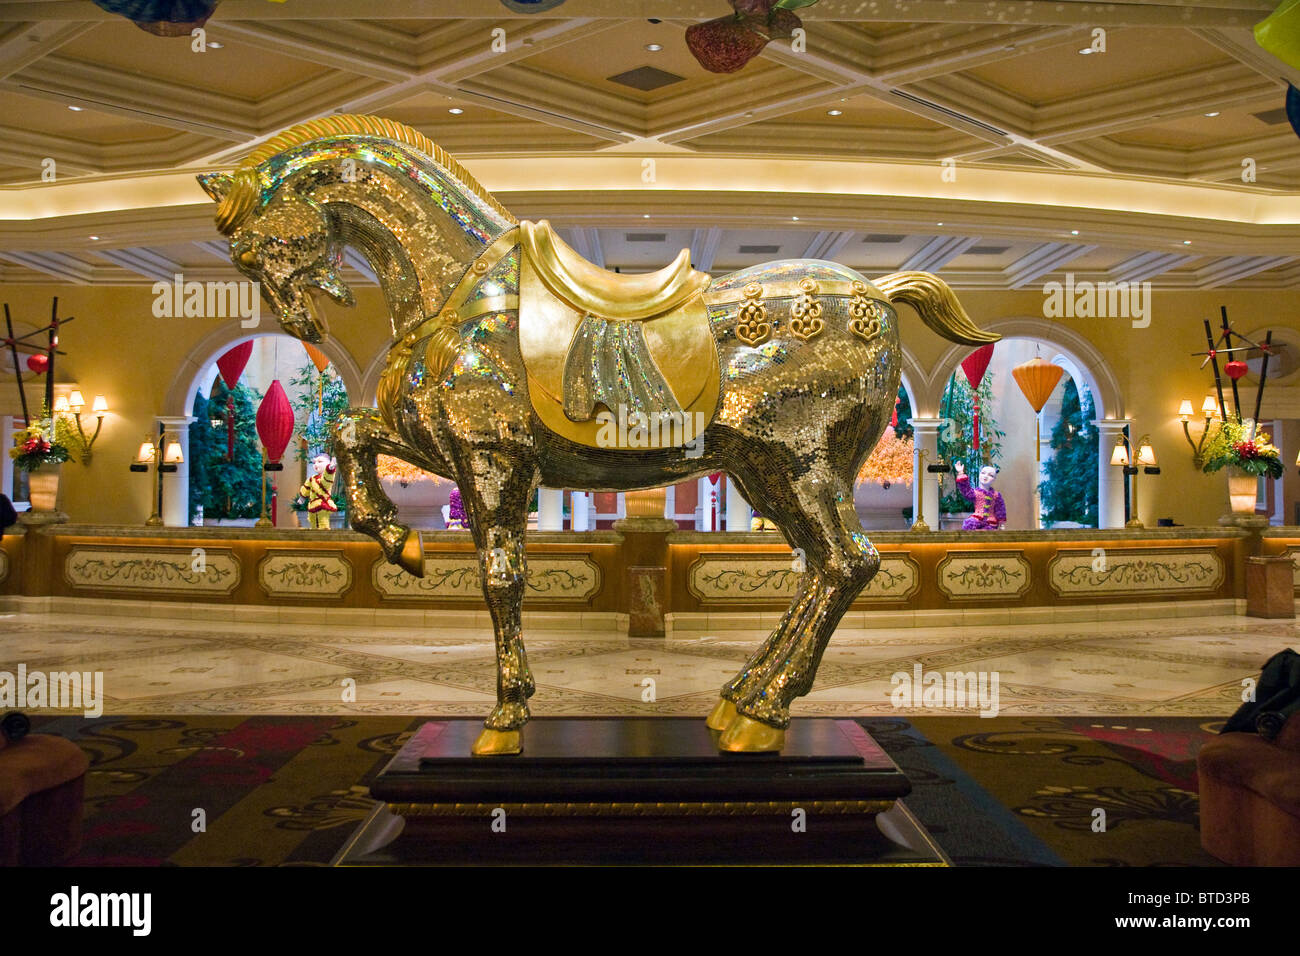 Hotel Lobby in Bellagio Las Vegas | Flickr - Photo Sharing! |Las Vegas Bellagio Hotel Lobby